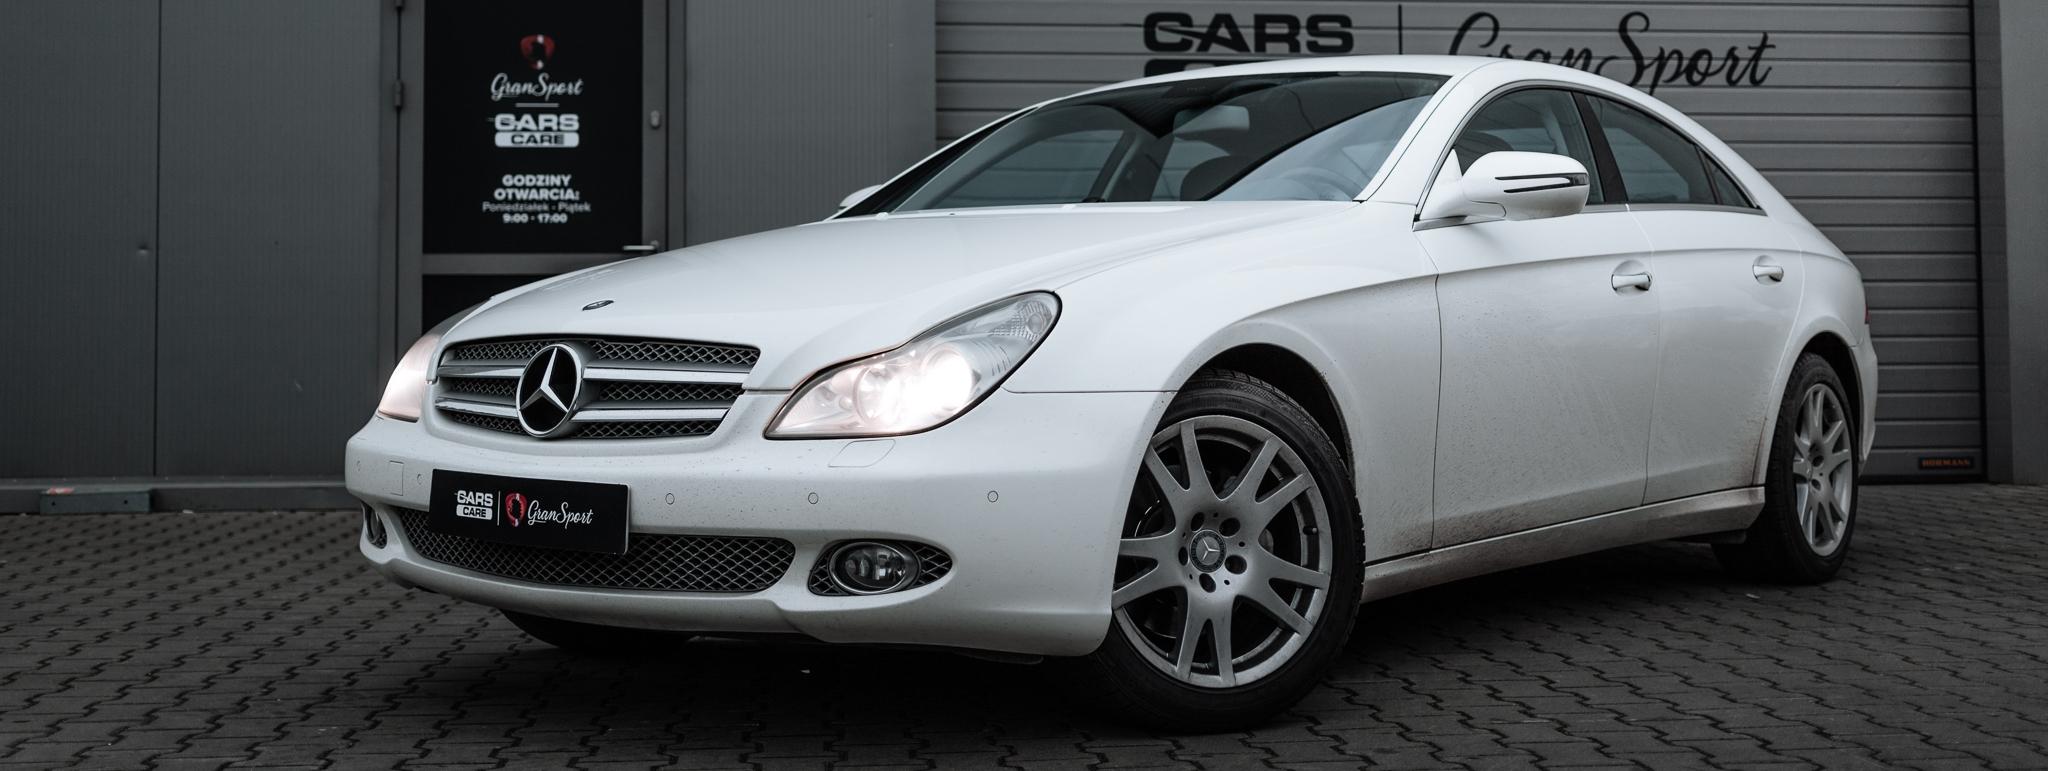 Mercedes CLS Maxhaust